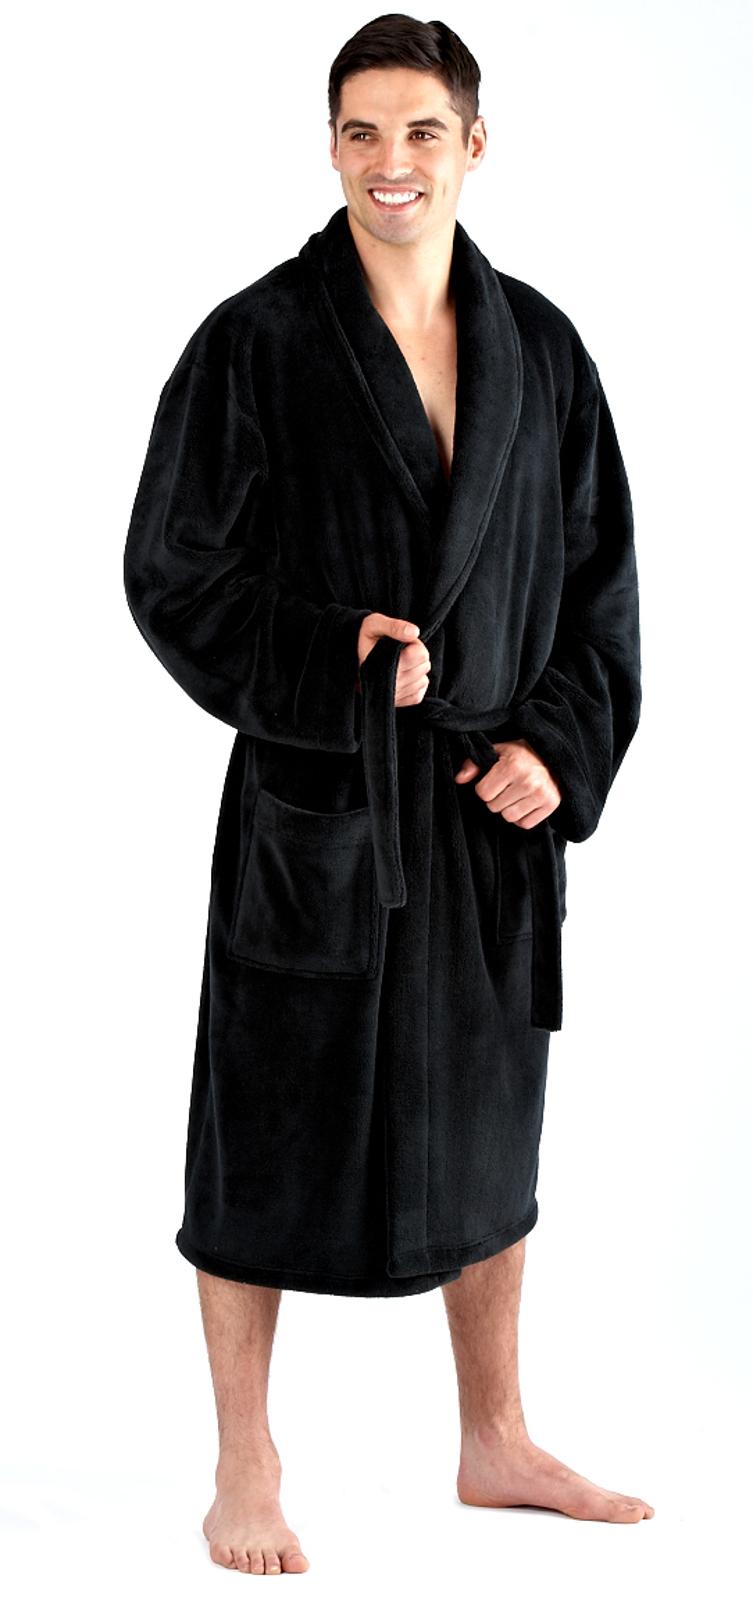 Mens Luxury Dressing Gowns Fleece Bath Robes House Coat